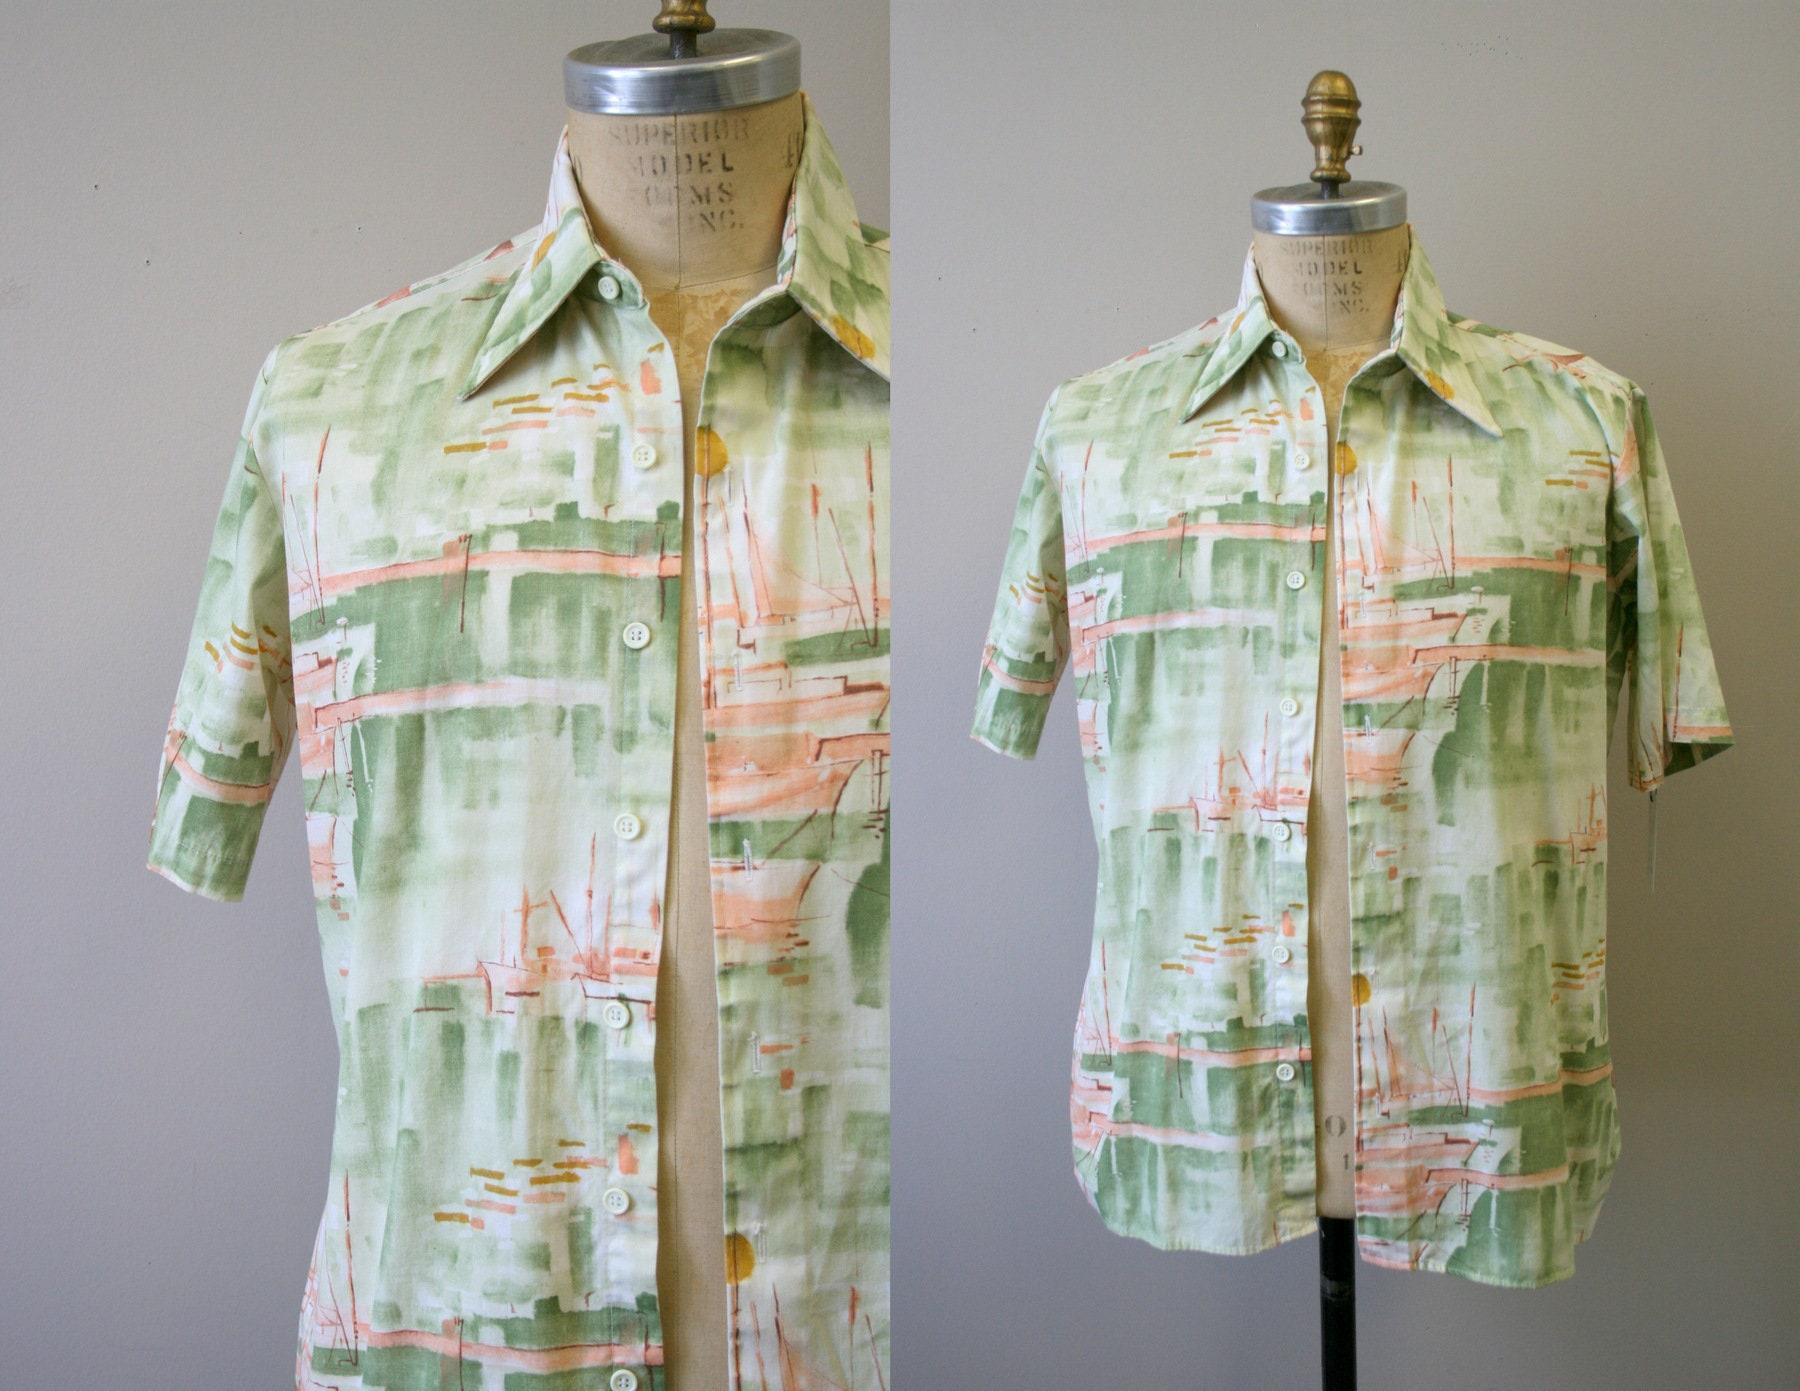 1970s Men's Shirt Styles – Vintage 70s Shirts for Guys 1970S Mens Boat Print Shirt $28.00 AT vintagedancer.com